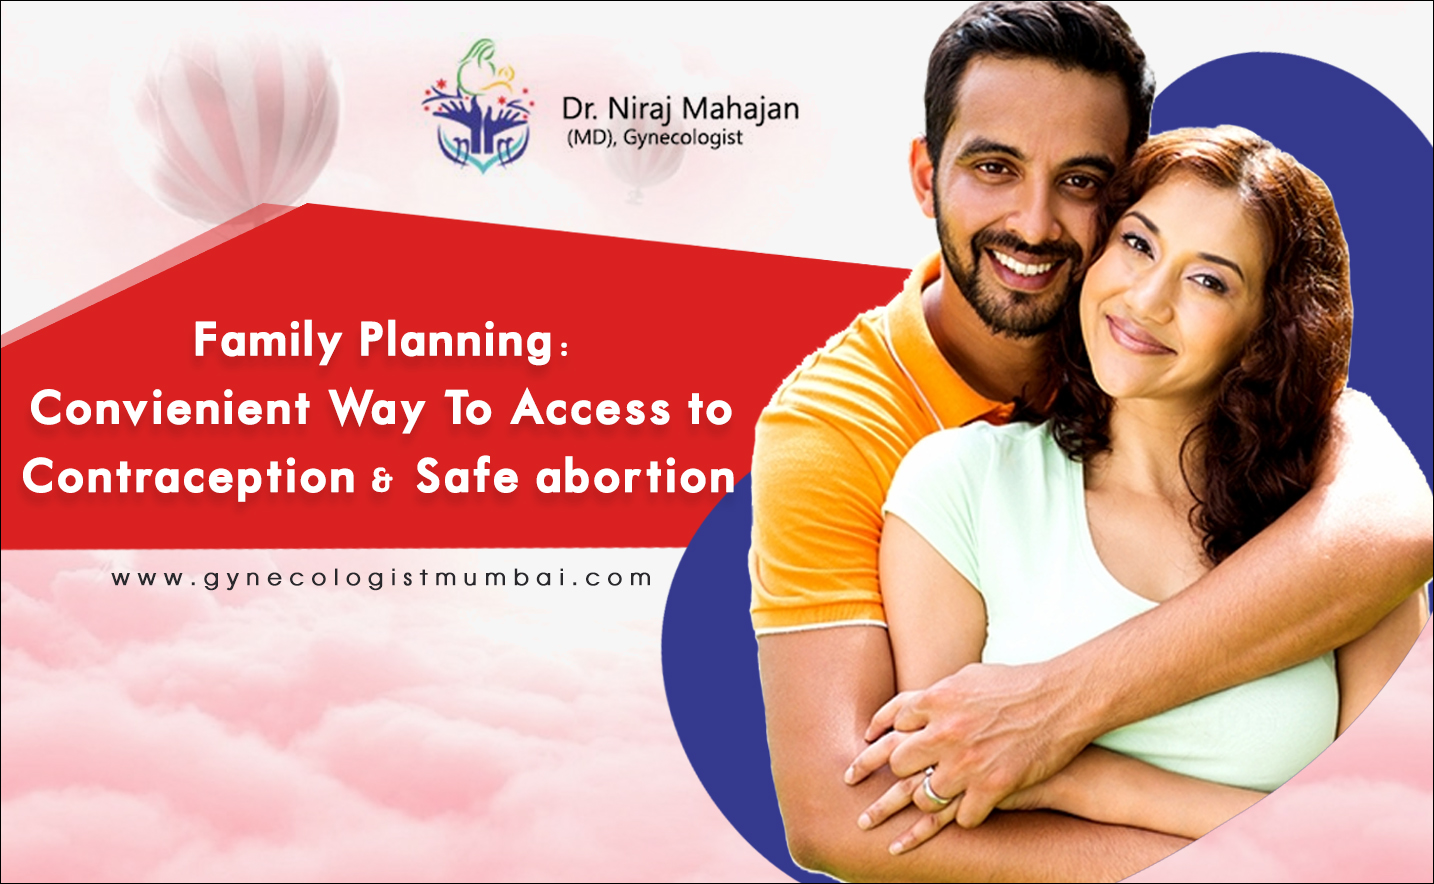 Family Planning Clinic Mumbai